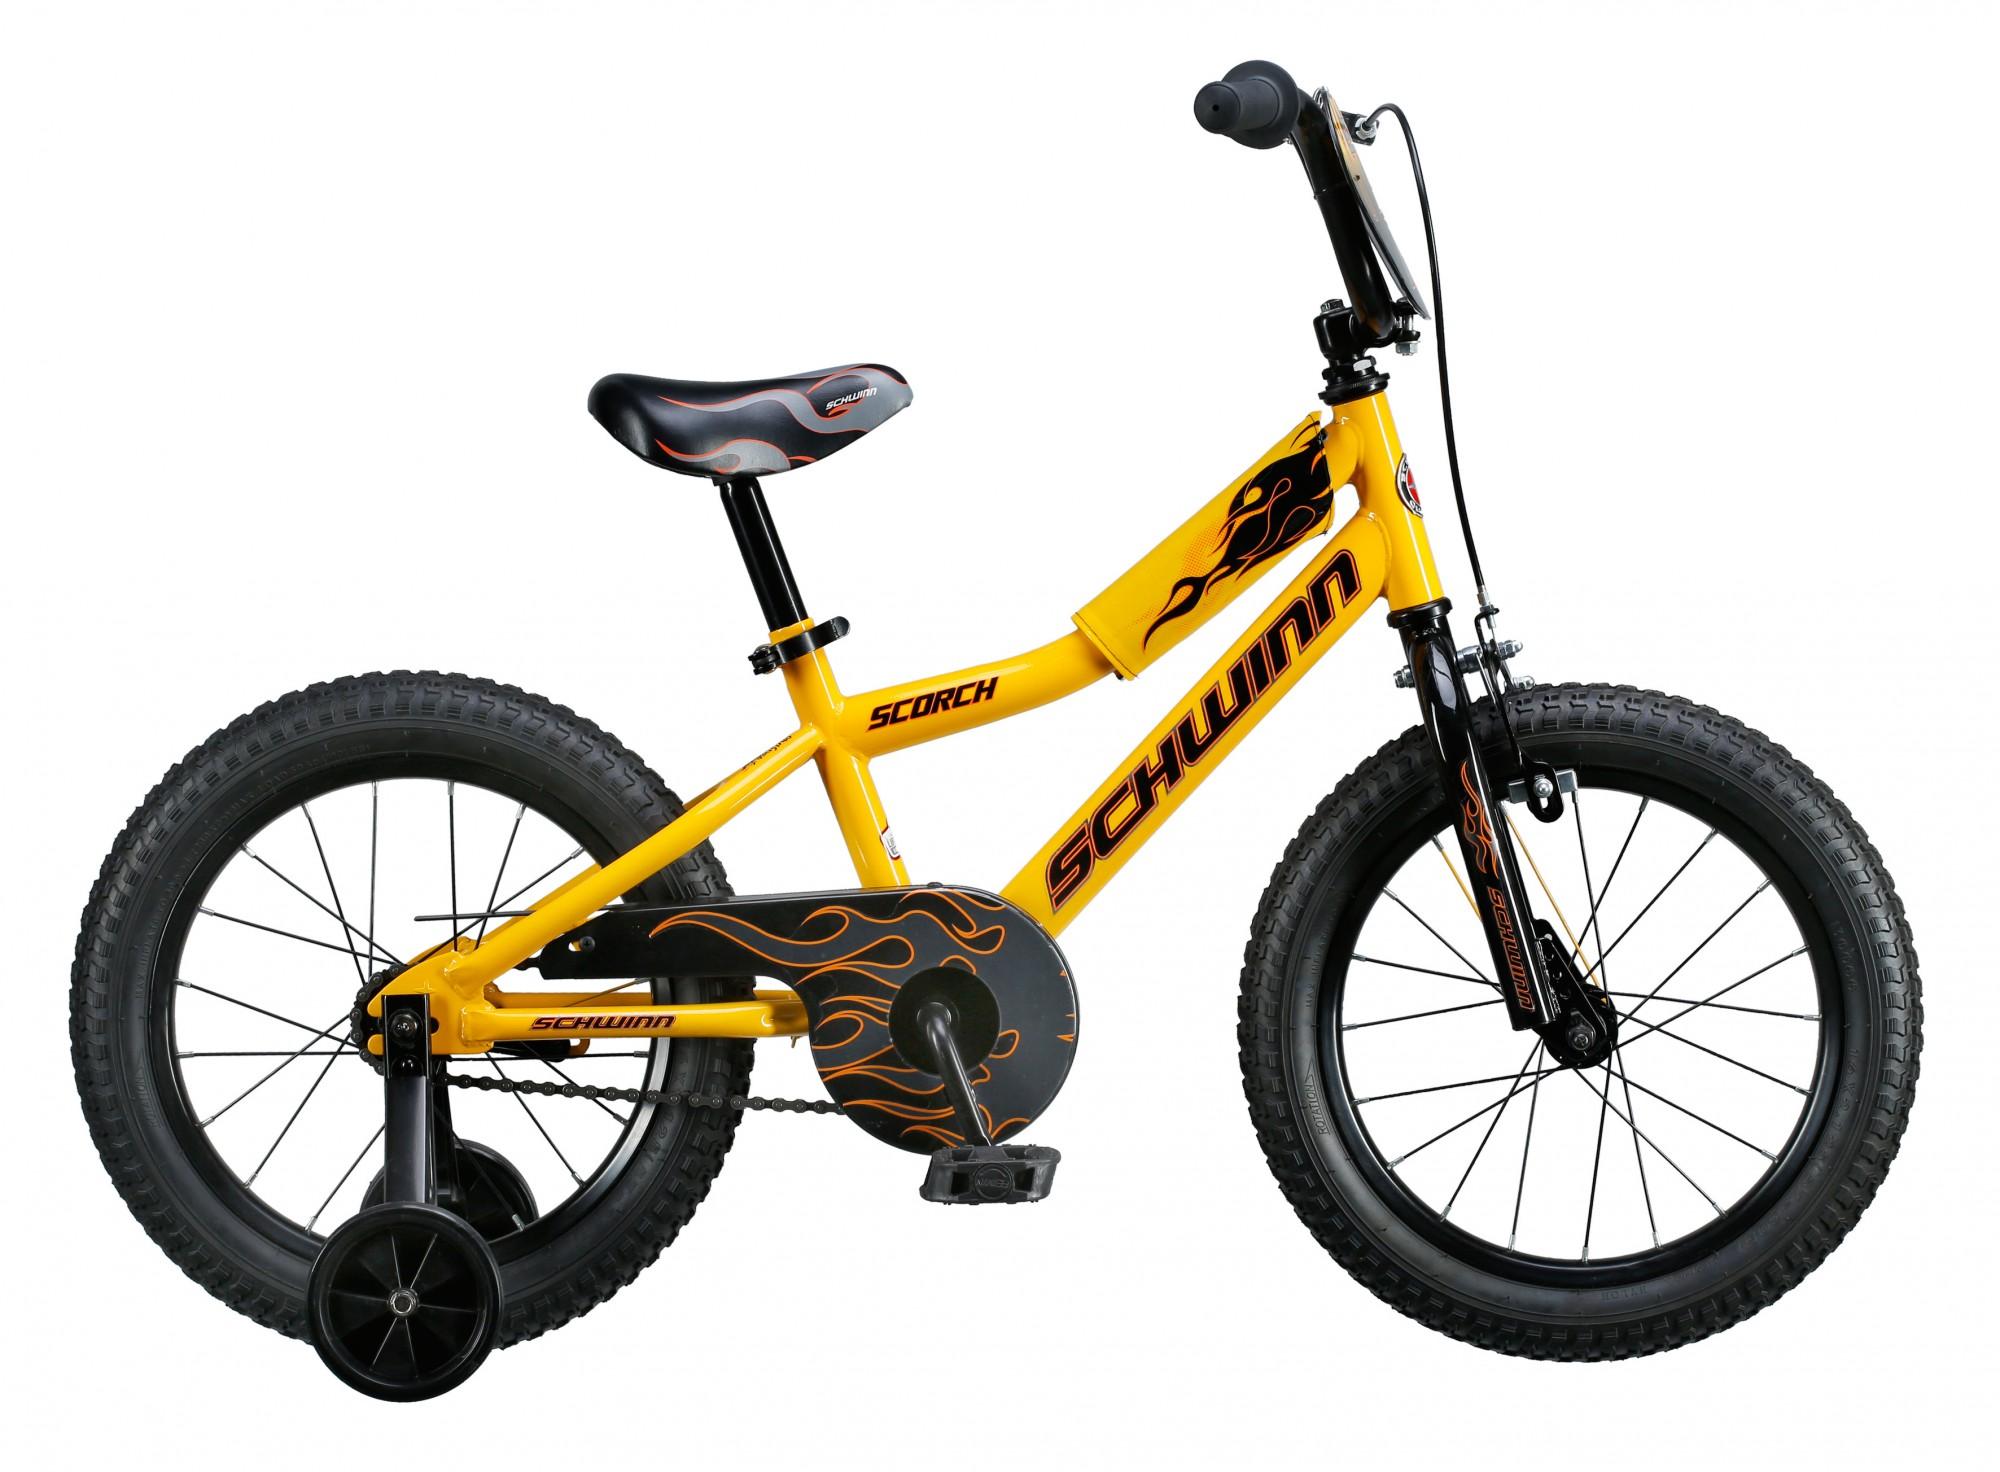 Велосипед SCHWINN Scorch 16 yellow, Велосипеды - арт. 826200390